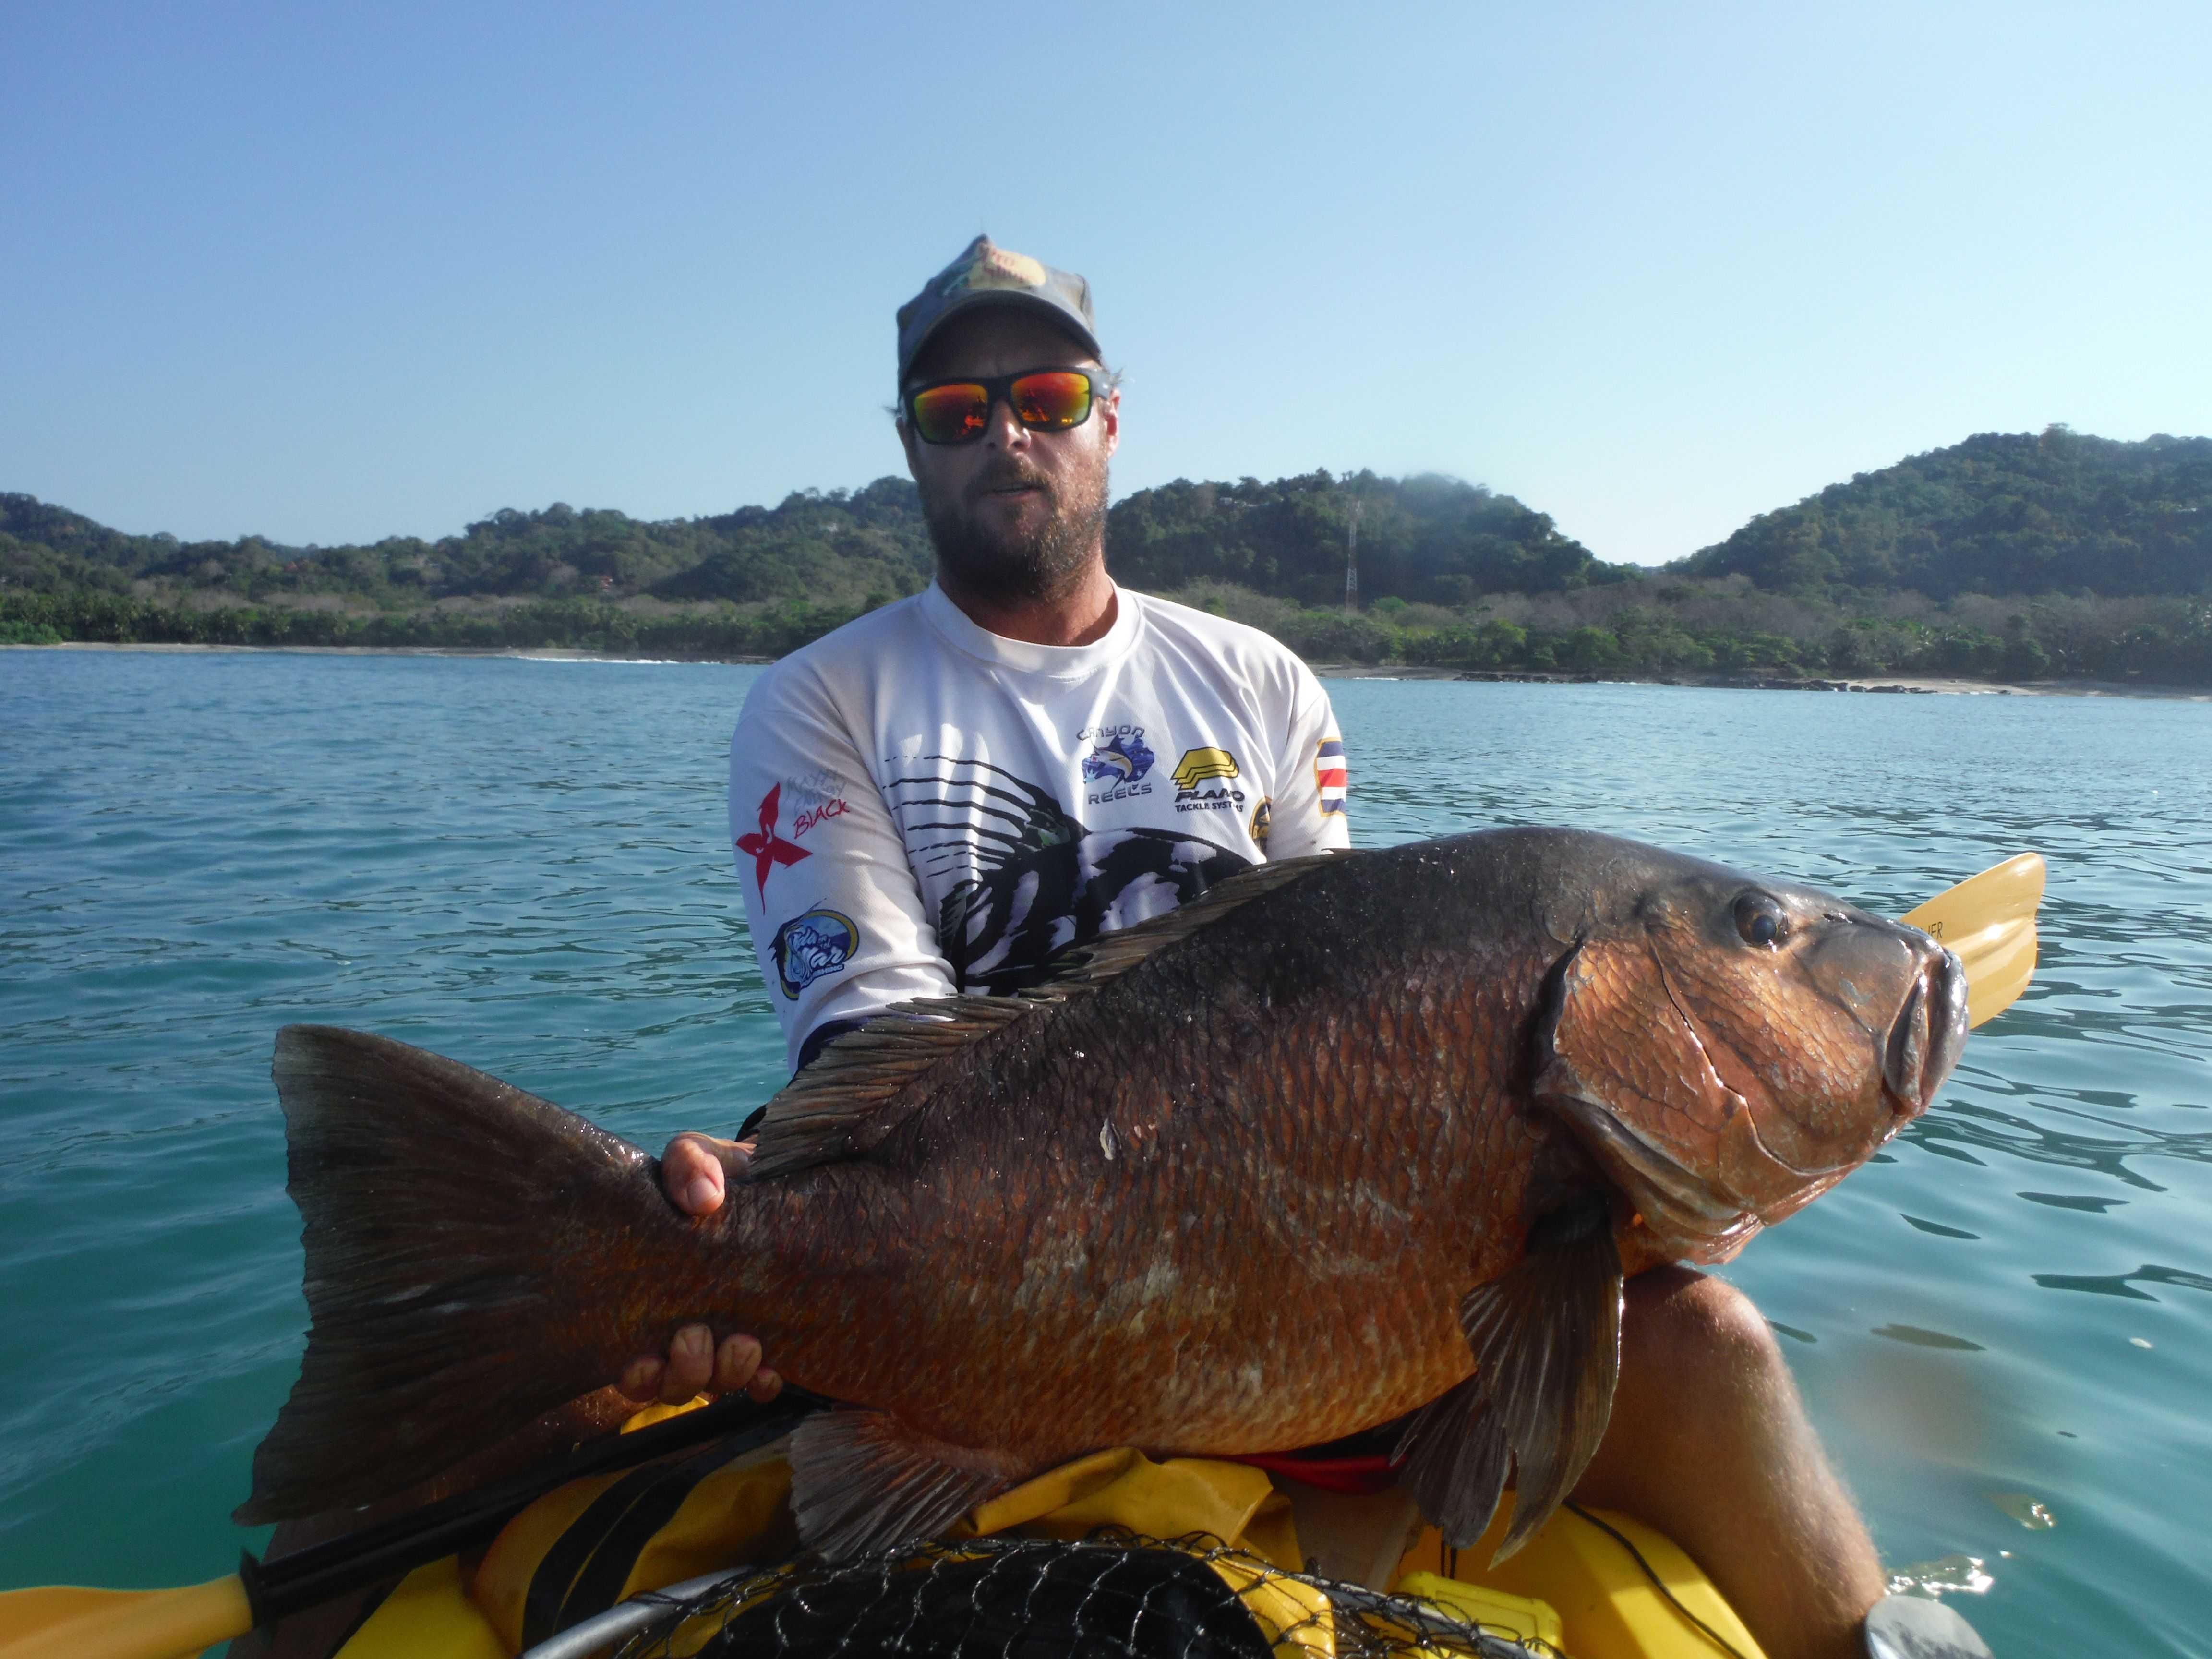 Costa rica kayak fishing report january 2016 for Costa rica fishing report